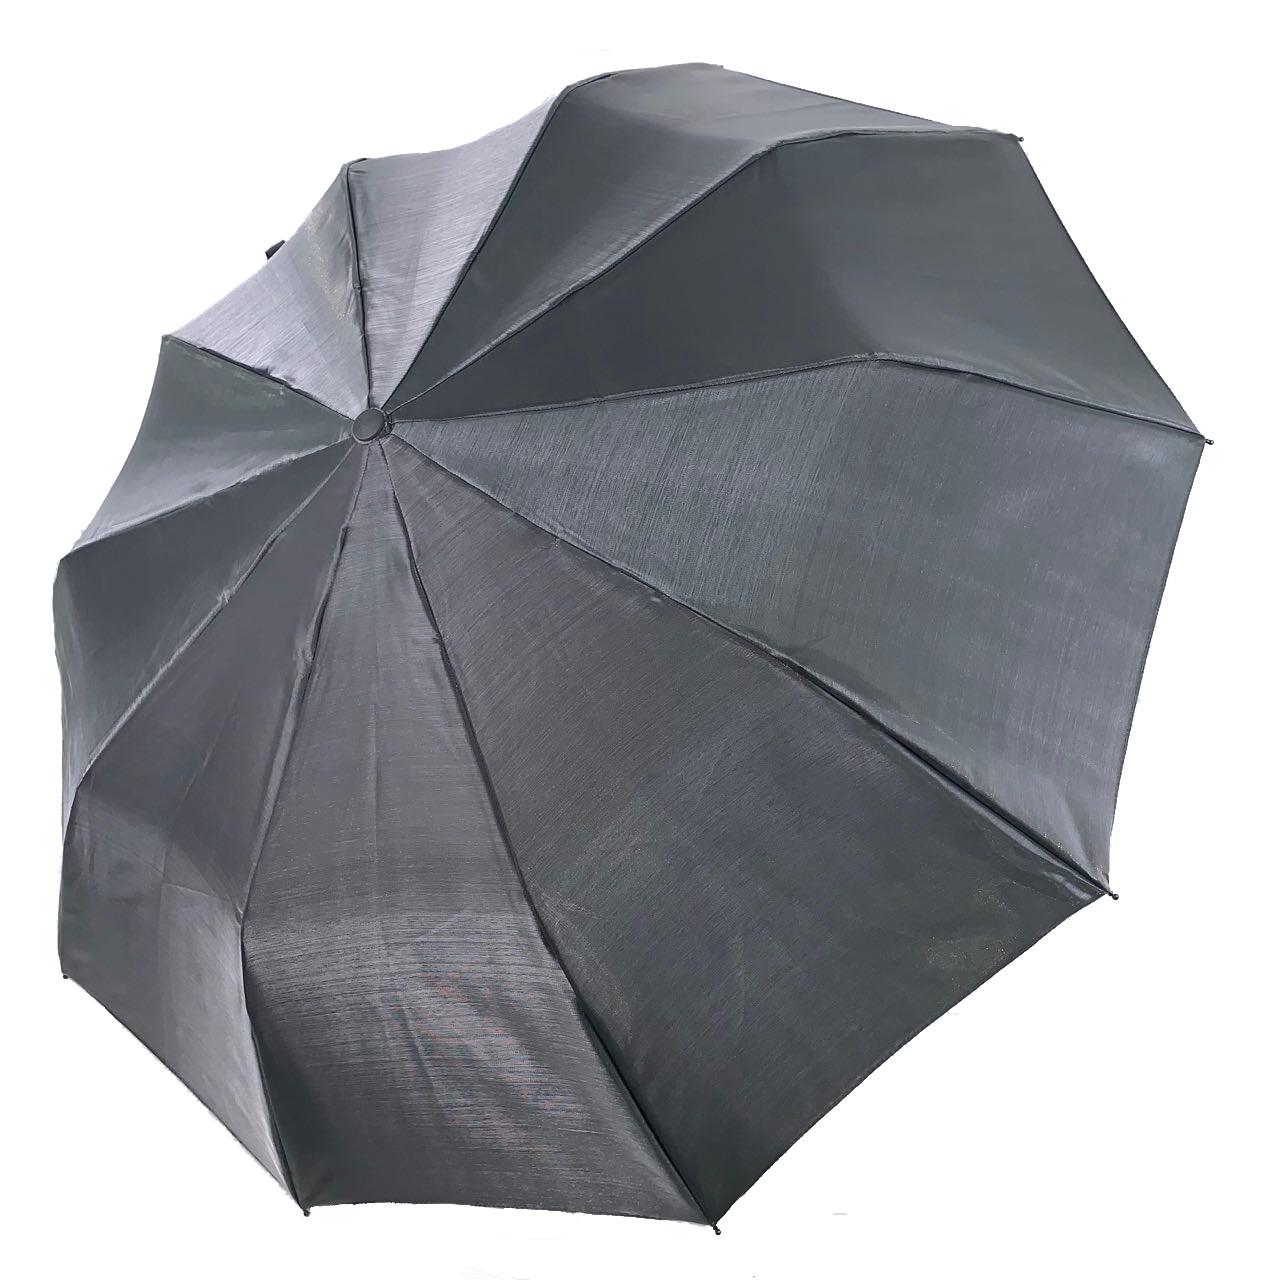 Женский зонт-полуавтомат Bellissimo хамелеон, серый,  SL1094-8